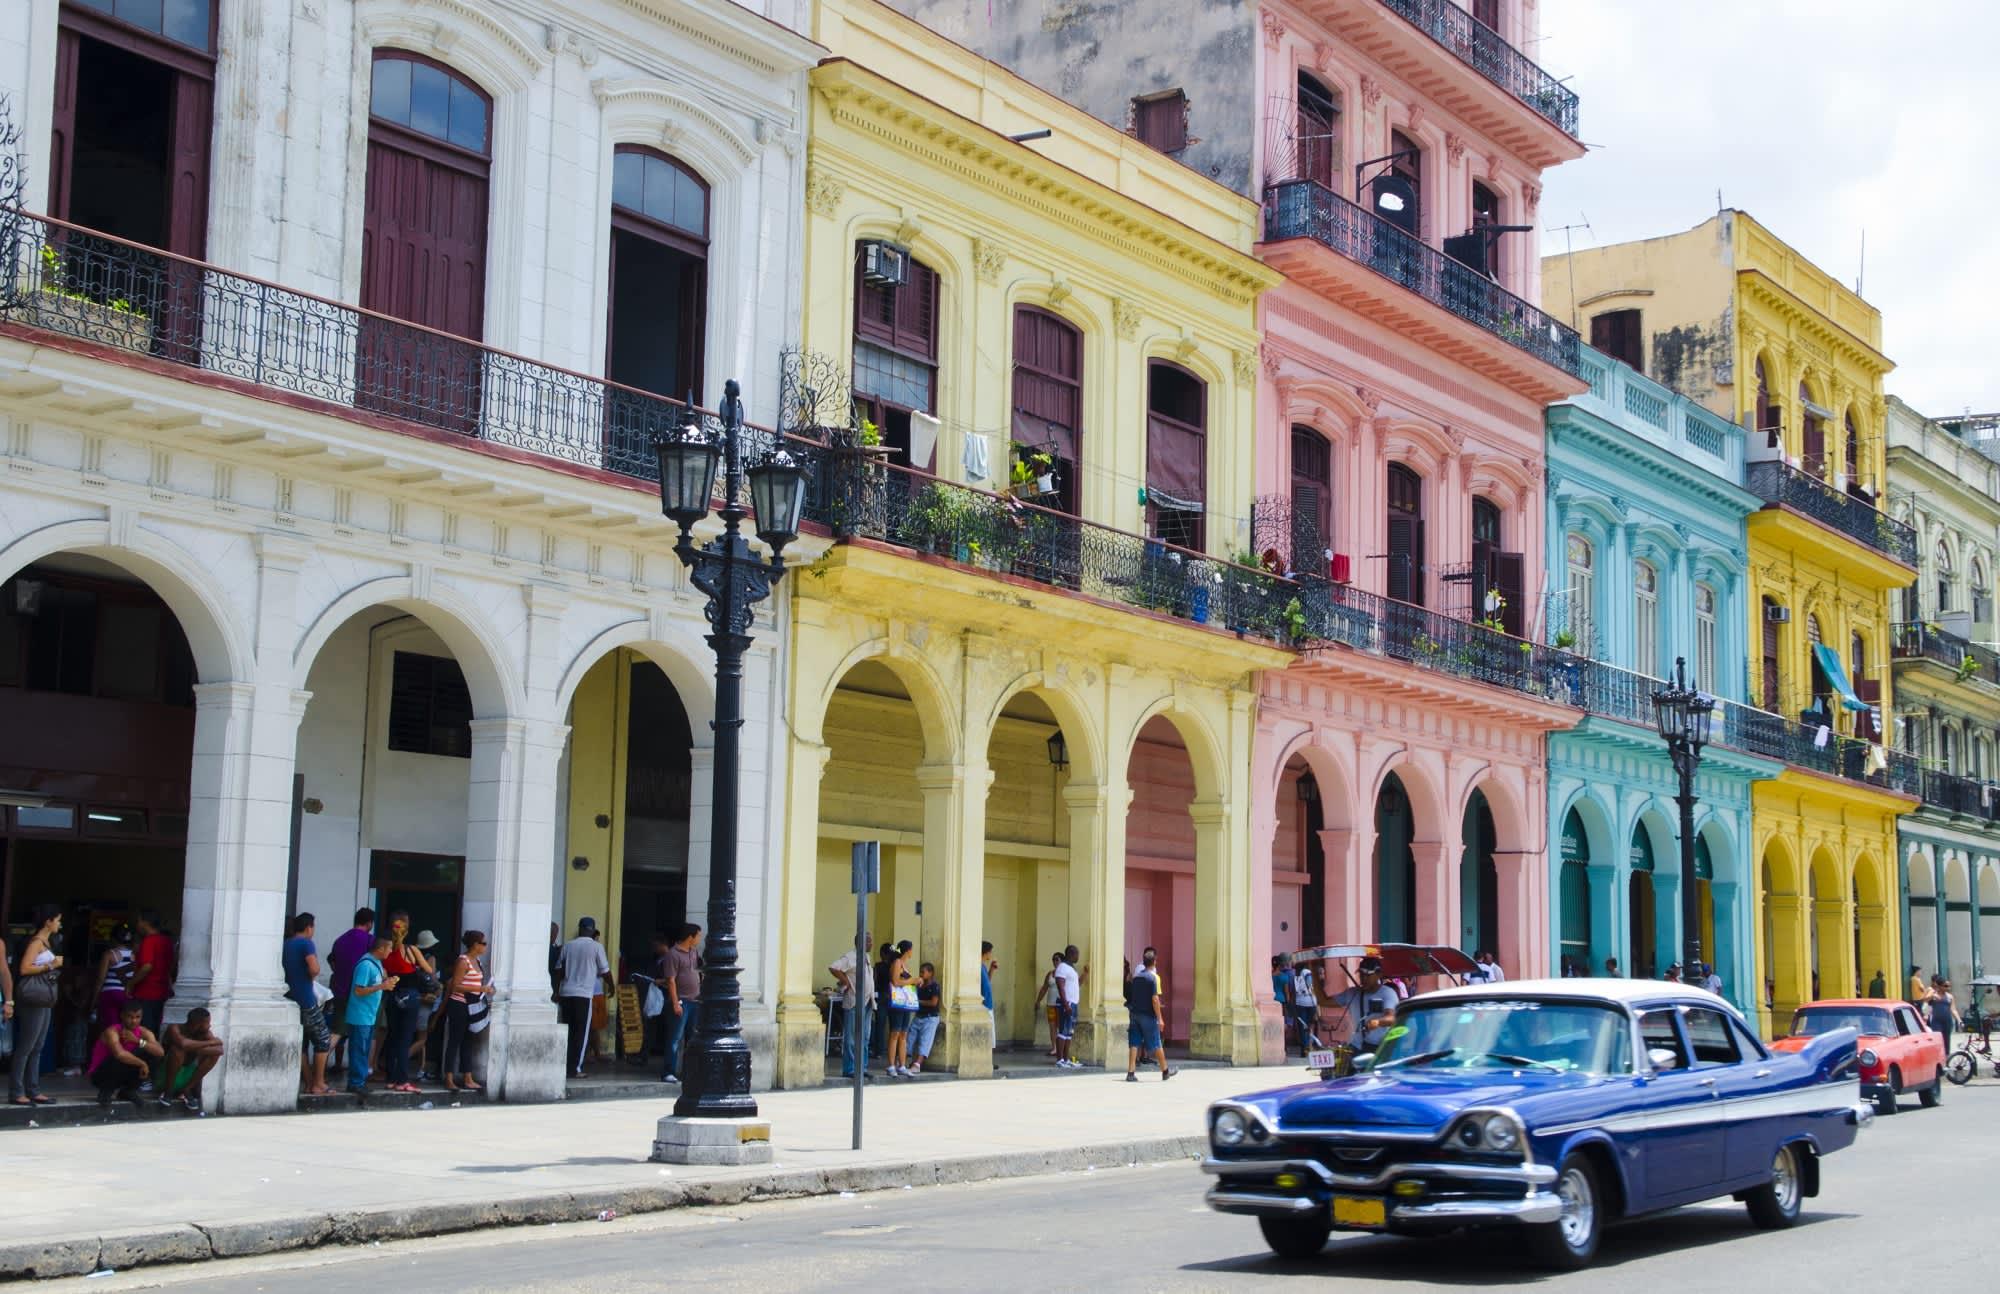 Interesting photos taken in Cuba